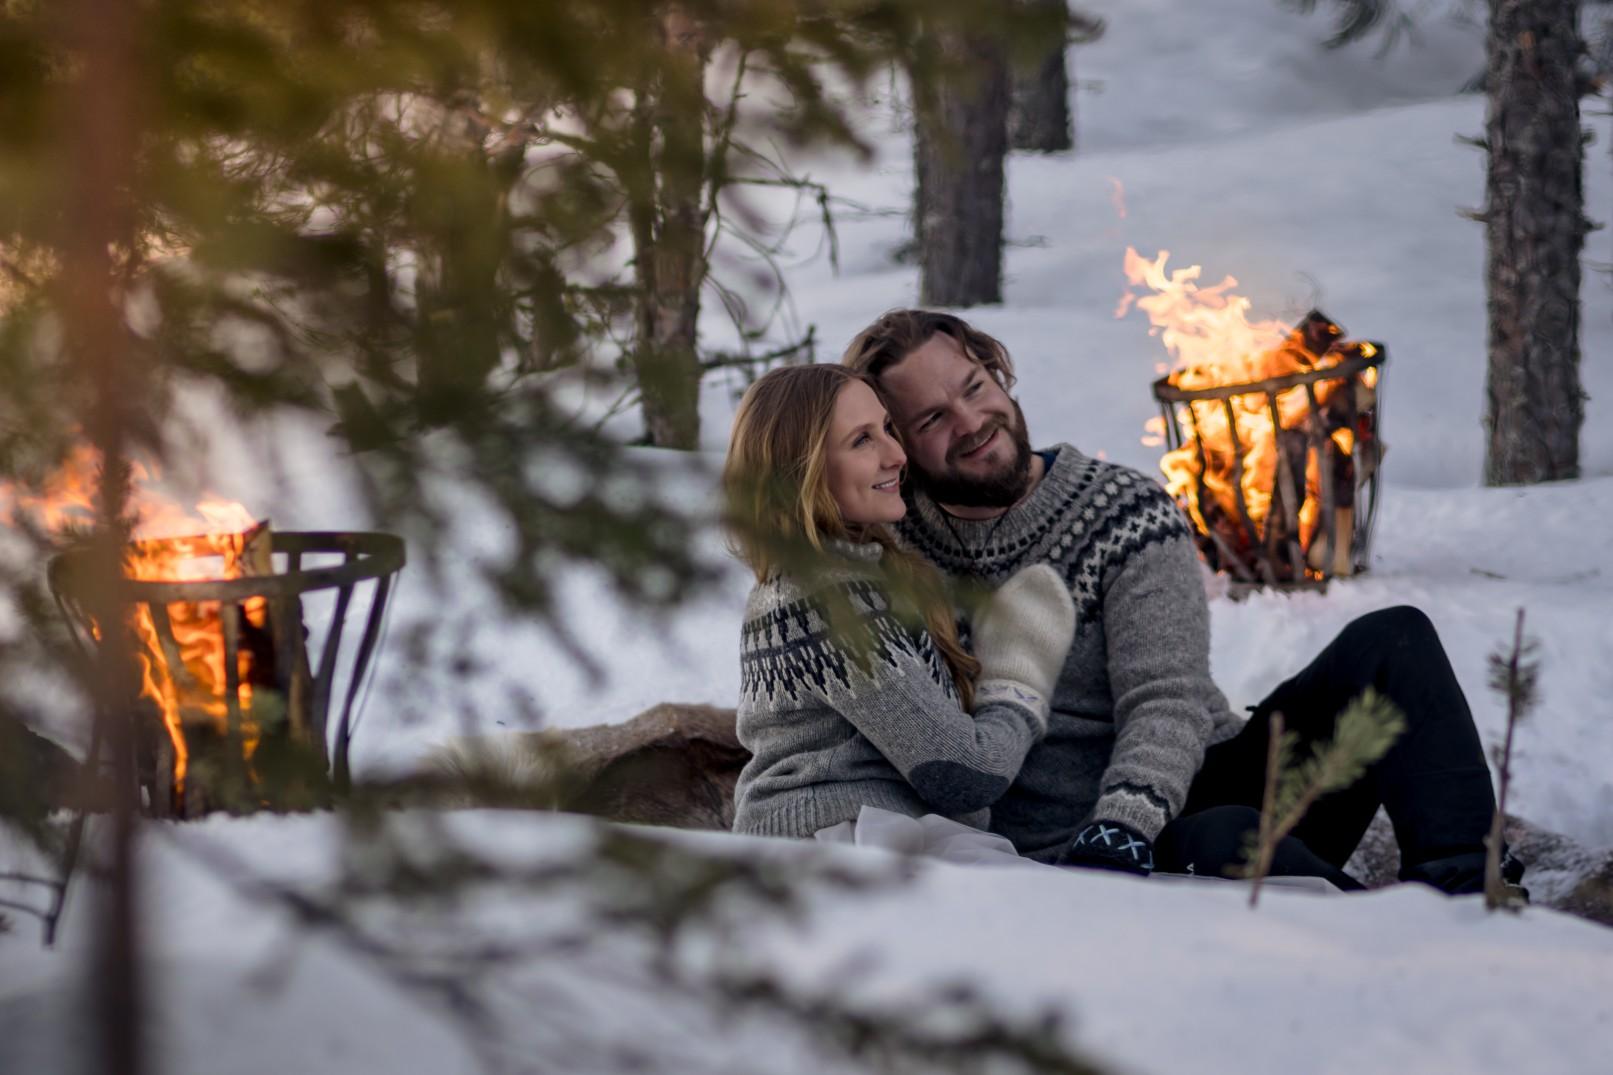 winter wedding at icehotel sweden - cinematic wedding photography - ice wedding - elopement in sweden - creative wedding photographer - unconventional wedding - alternative wedding - unique wedding - artistic wedding -snow wedding